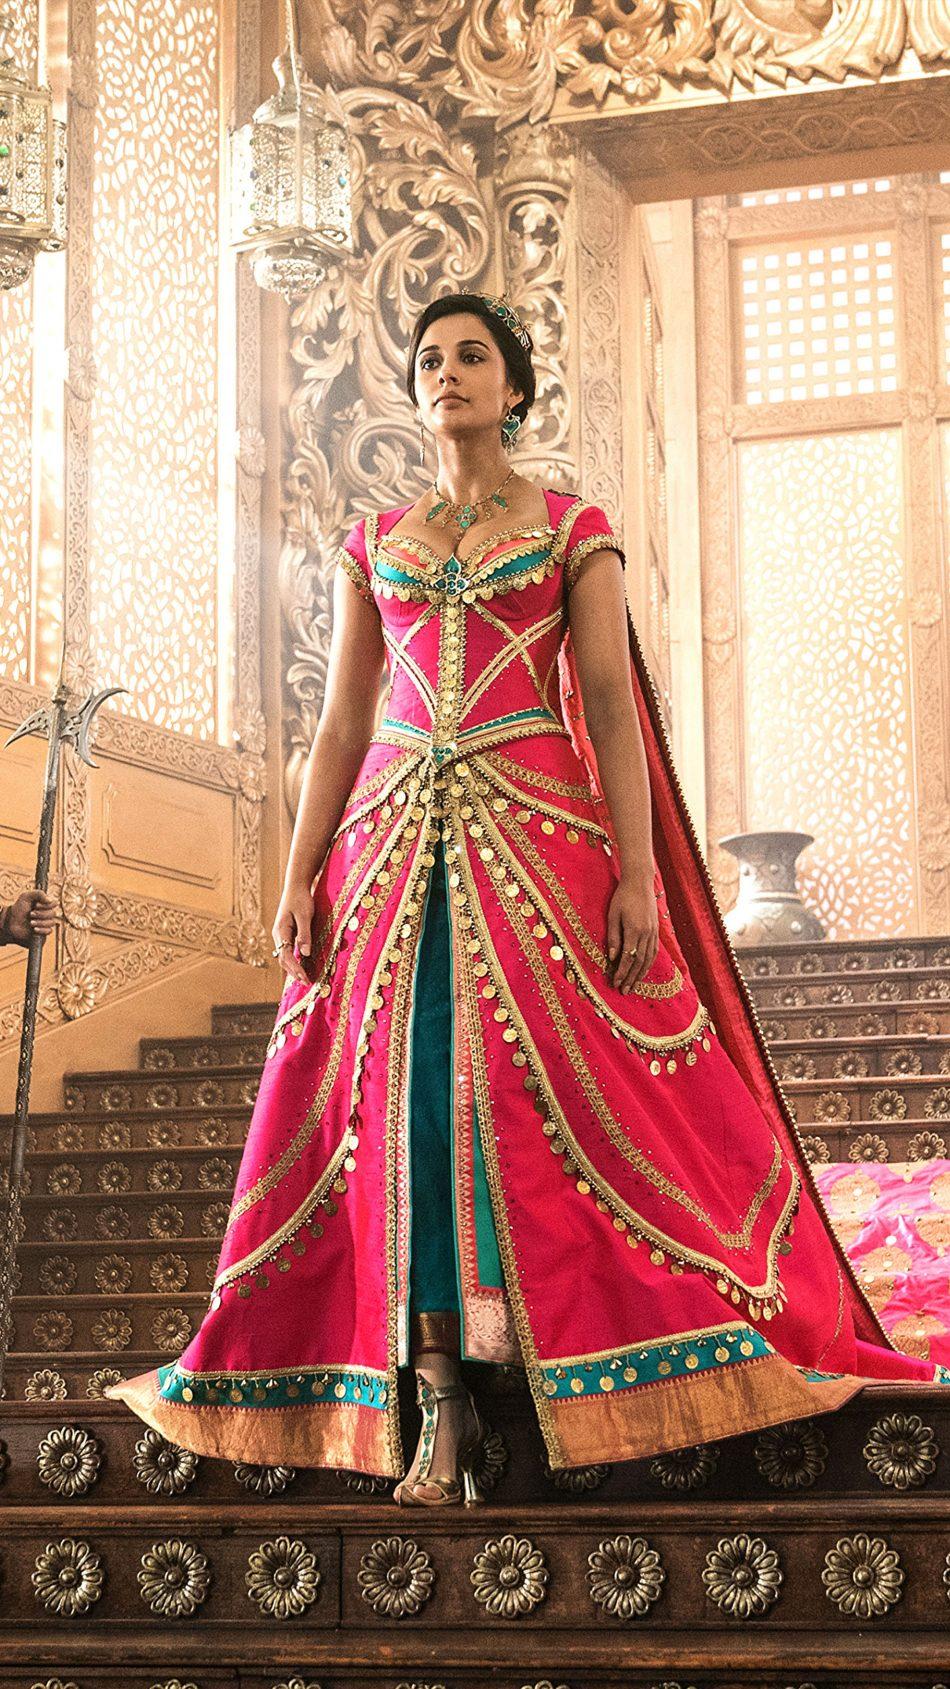 Free Download Download Princess Jasmine In Aladdin Naomi